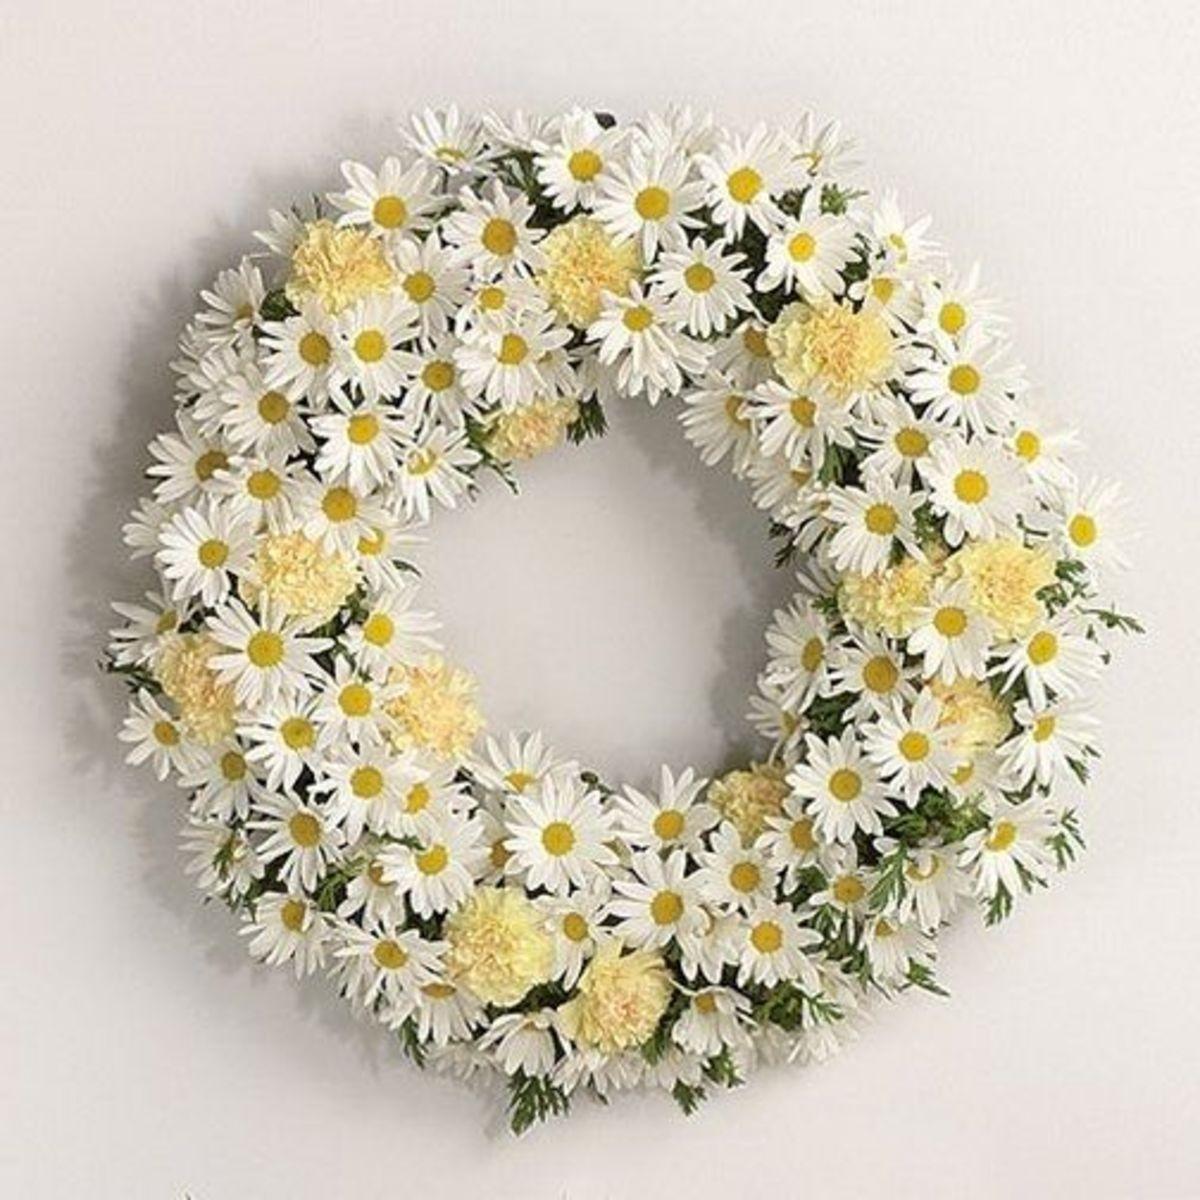 Flower Wreaths For Weddings: Daisy Wedding Theme